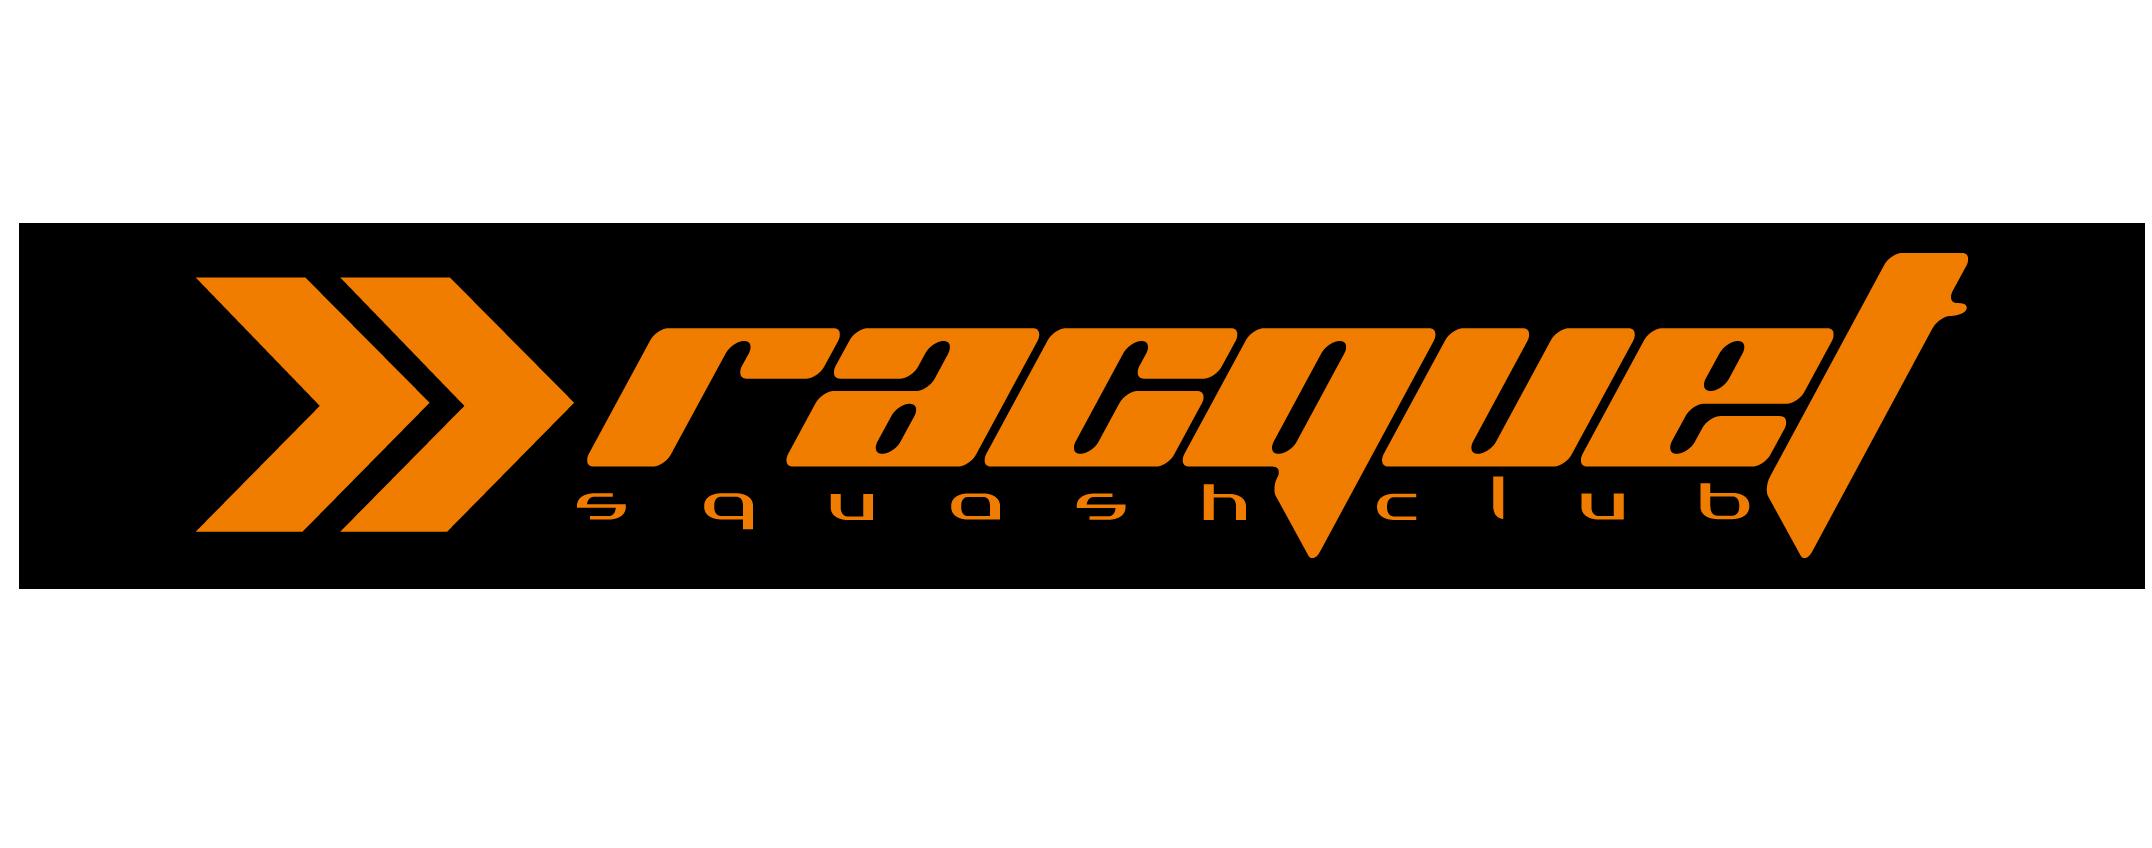 racquet logo3